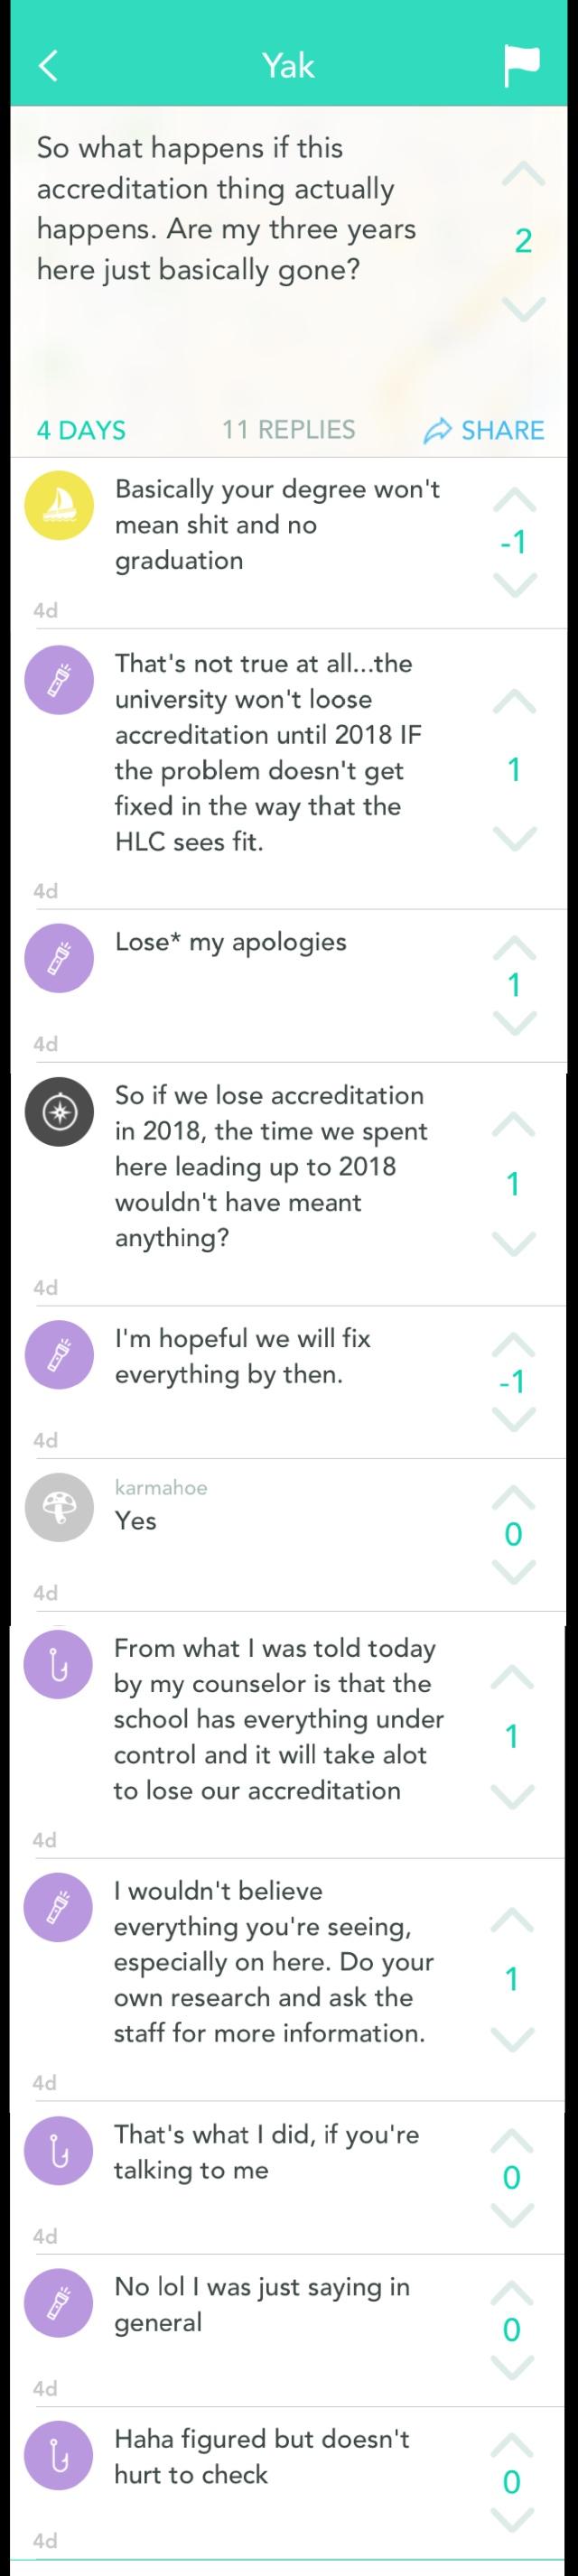 YikYakAccreditationThing